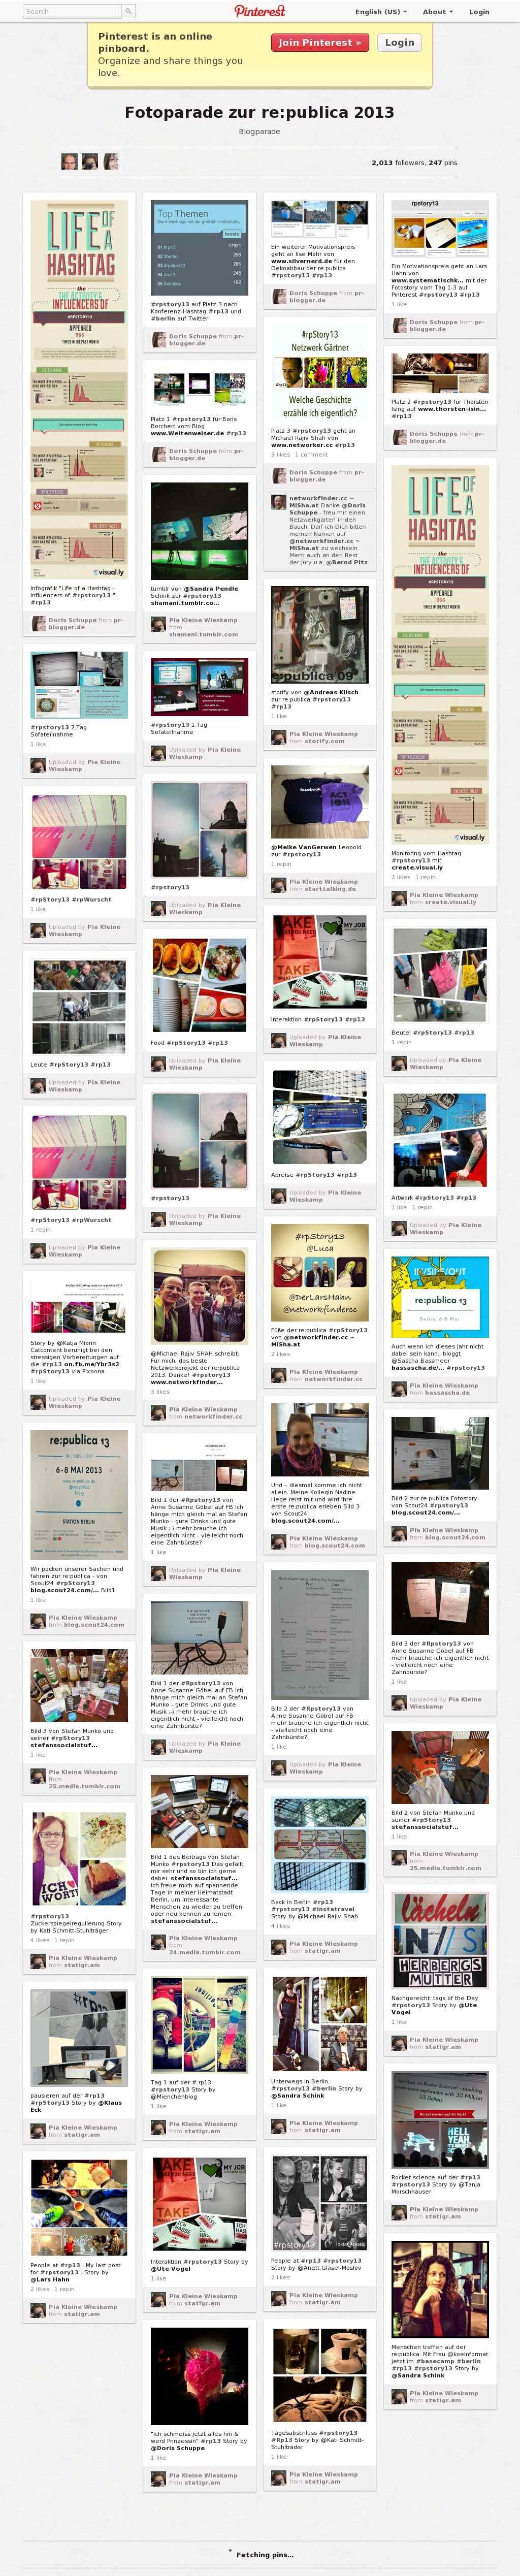 One of the greatest #SocialMedia #Networking Ideas of 2013 #rpStory13 by @Pia Lappalainen Kleine Wieskamp @Doris Vee Schuppe @Klaus Ødegårdstuen Eck  #FF Visual Storytelling http://pr-blogger.de/2013/05/31/die-sieger-der-fotoparade-zur-republica/